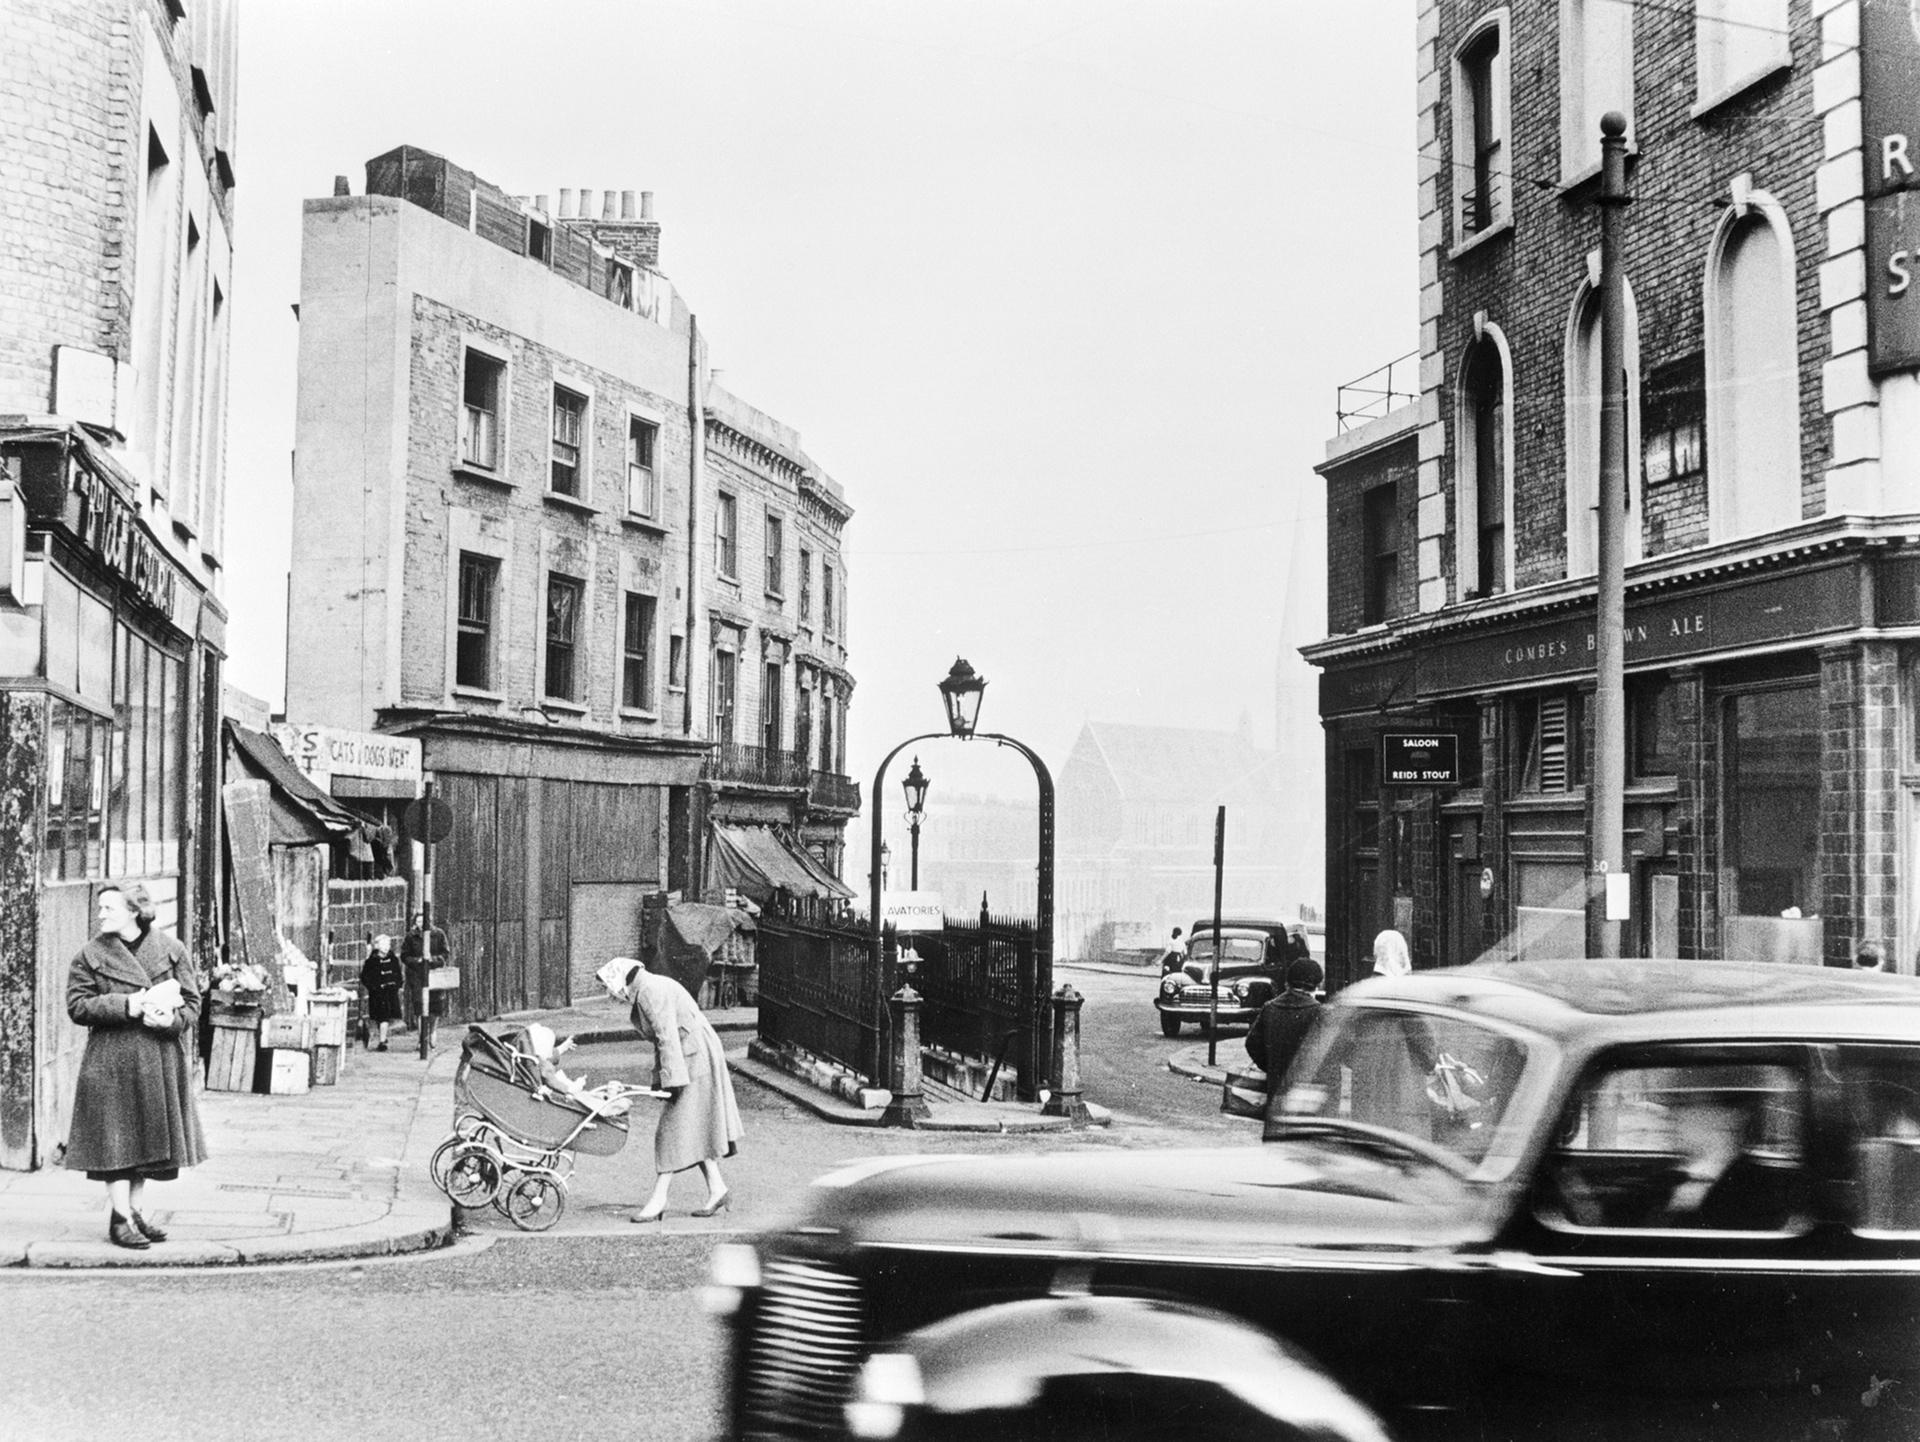 1956. Уличная сцена на Харроу-роуд, Лондон